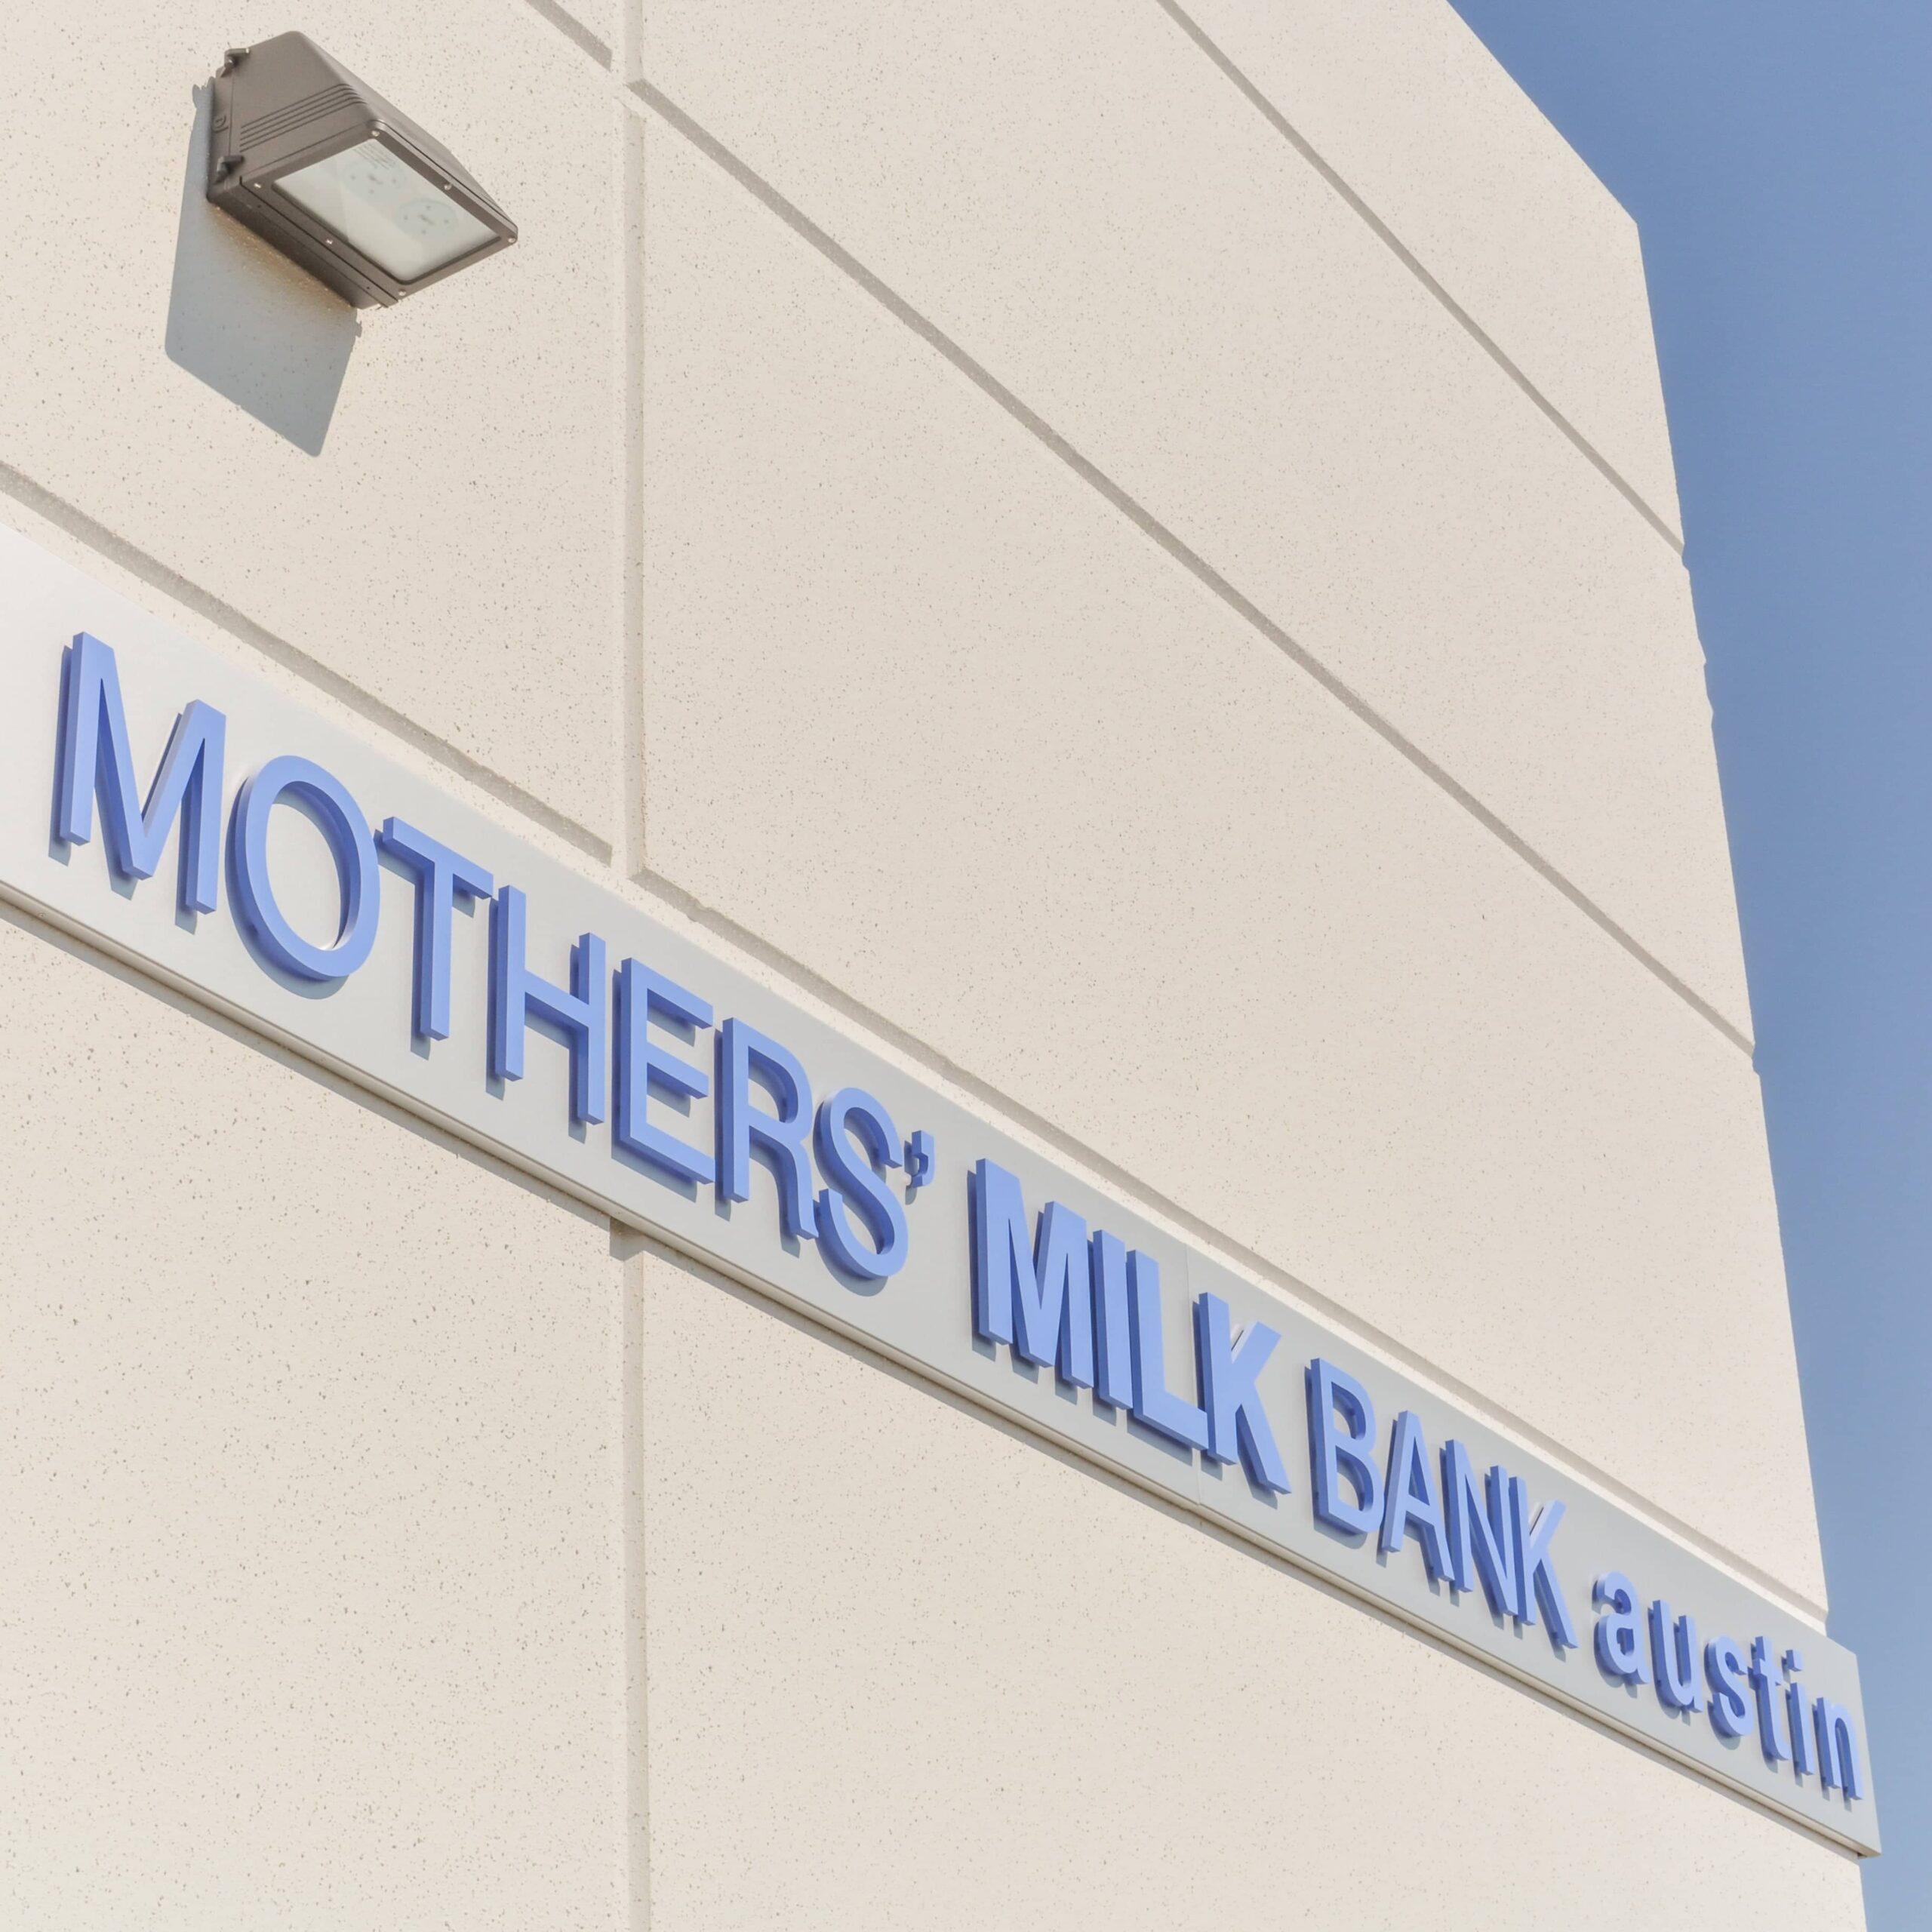 Mothers Milk Bank Austin Logo on Building